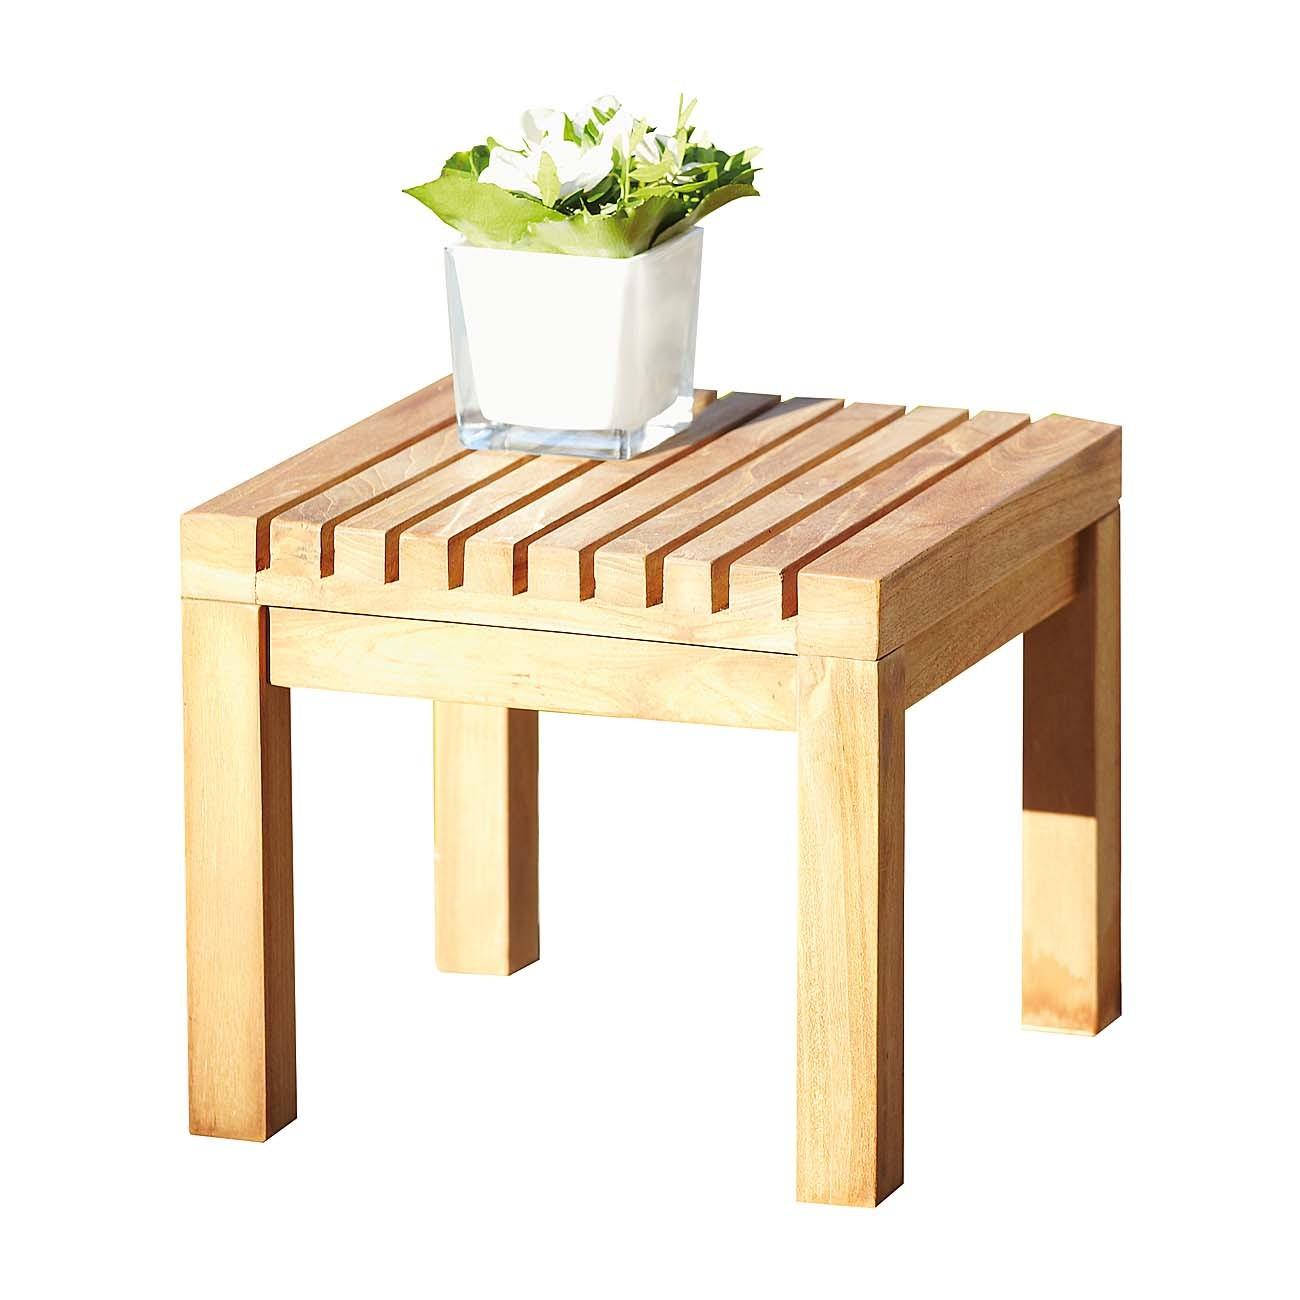 jan kurtz nice hocker beistelltisch eckig teak 492875 eingang garten gartenm bel gartenhocker. Black Bedroom Furniture Sets. Home Design Ideas